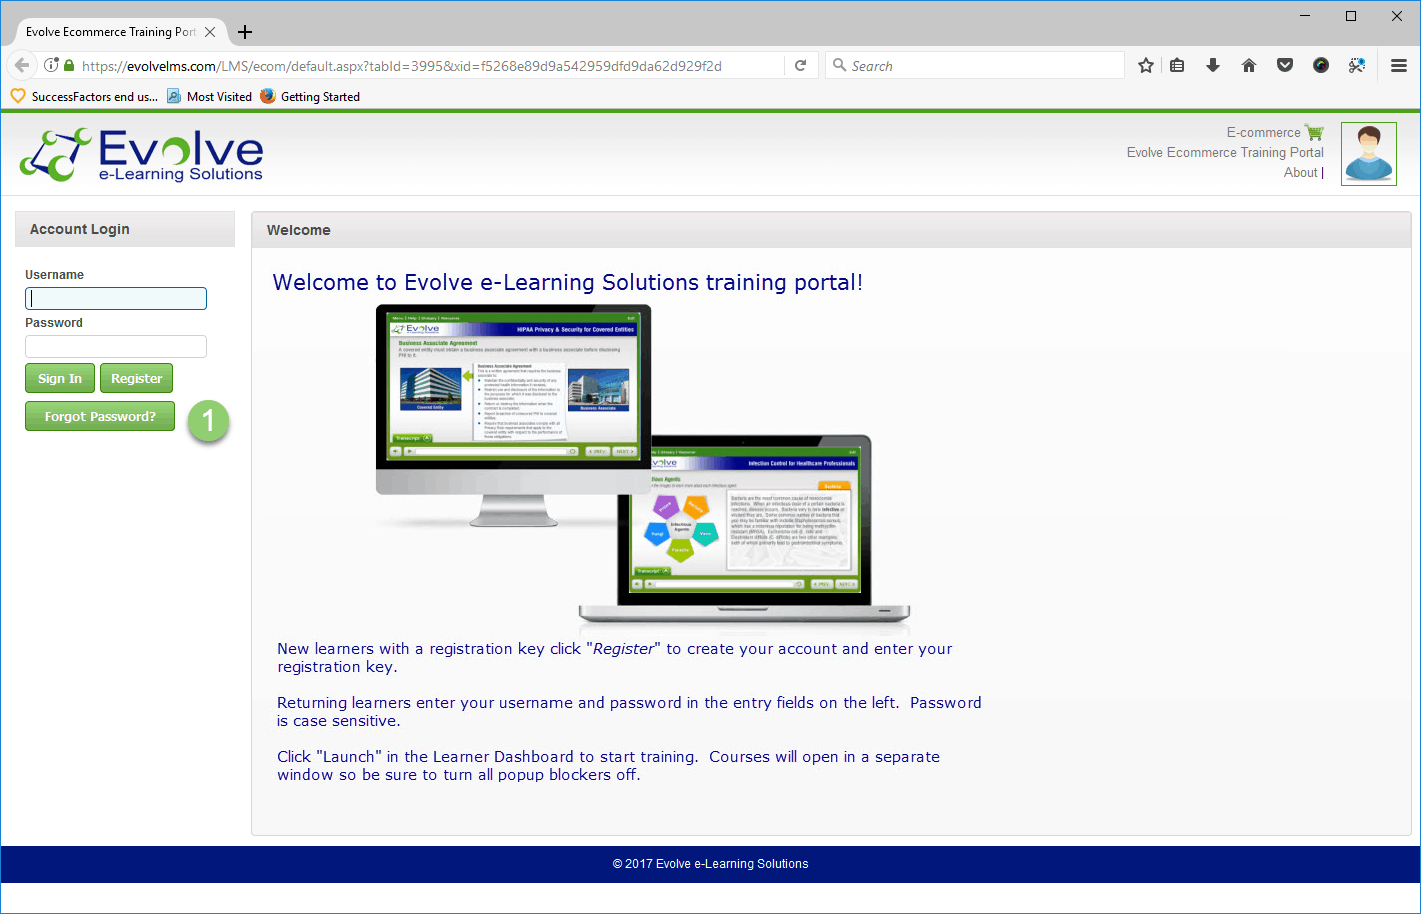 Select Register